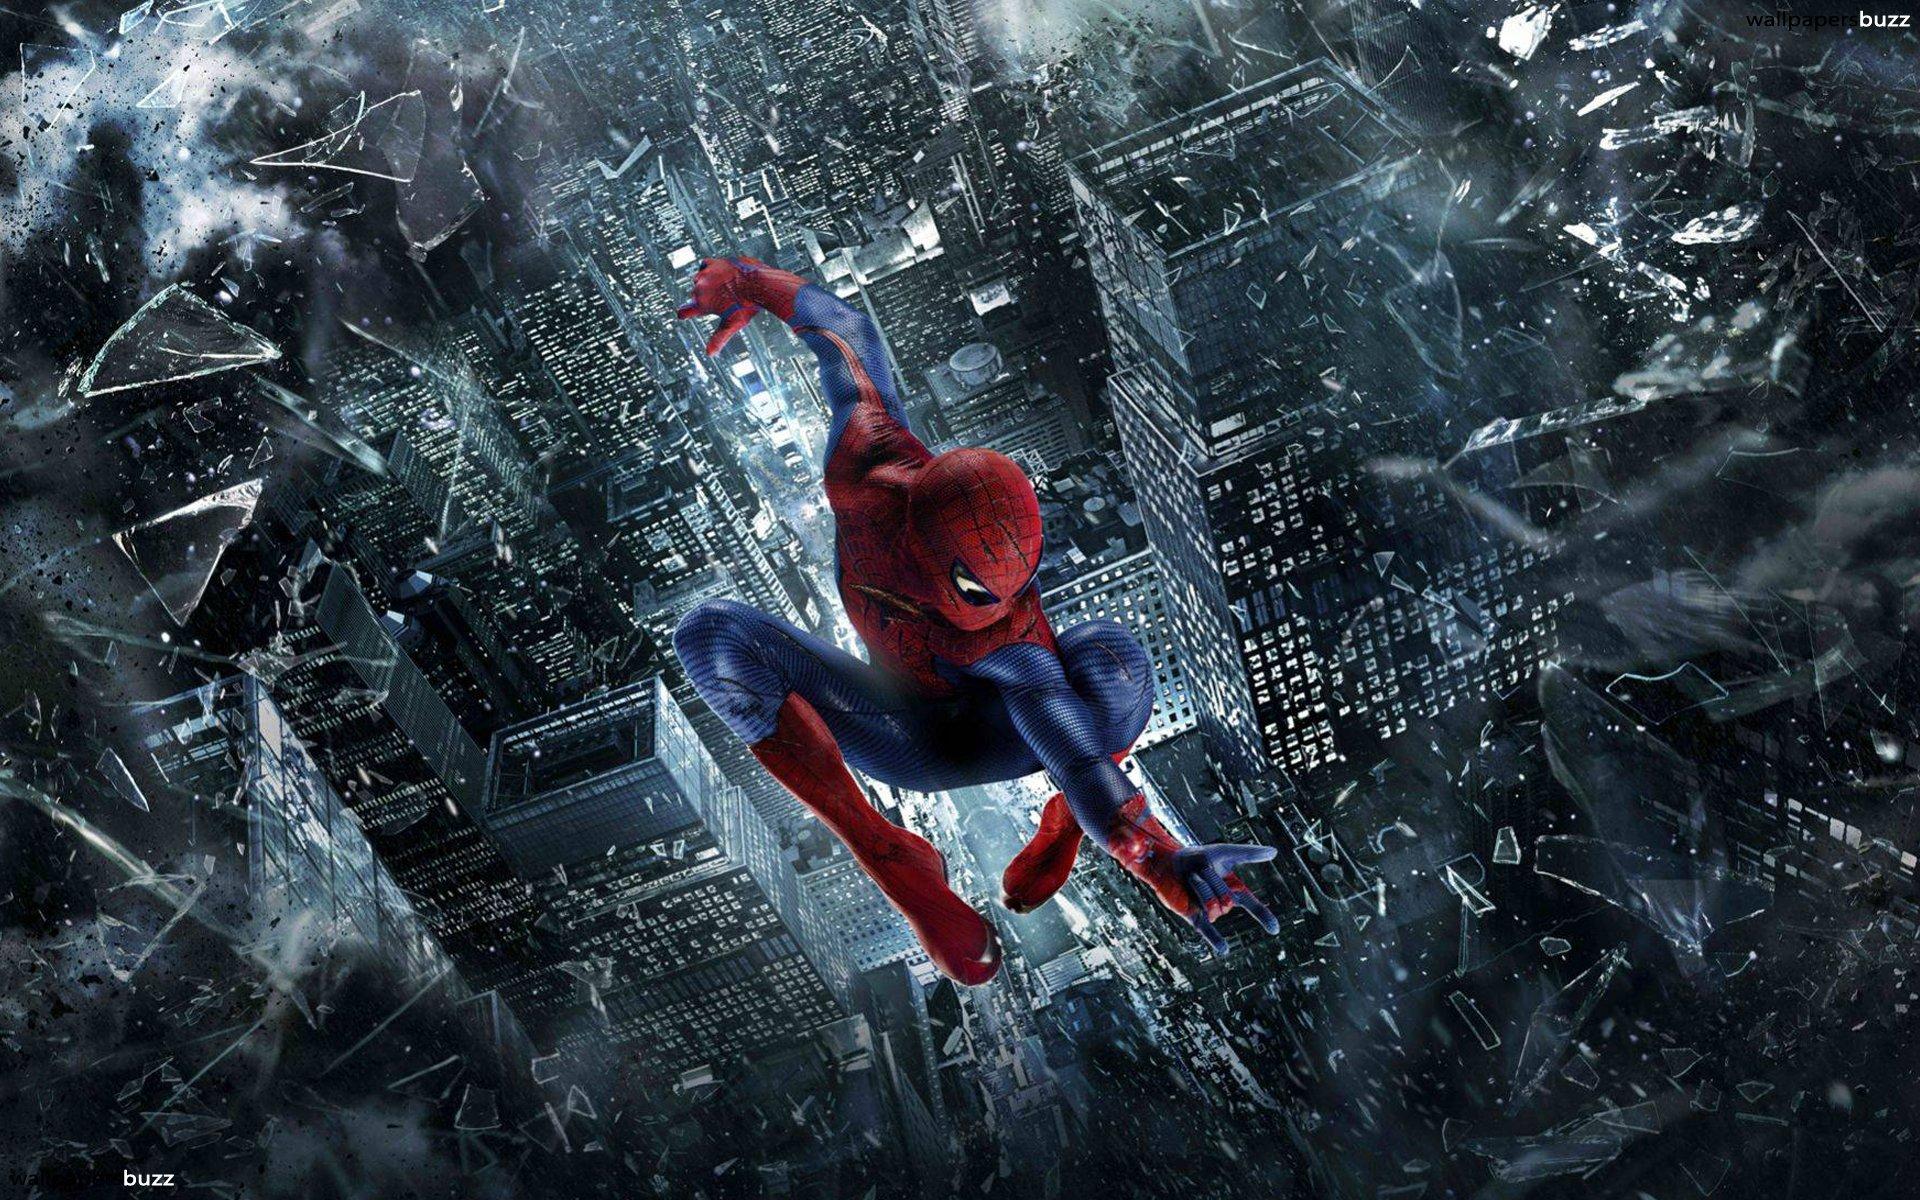 Spiderman Wallpaper 15